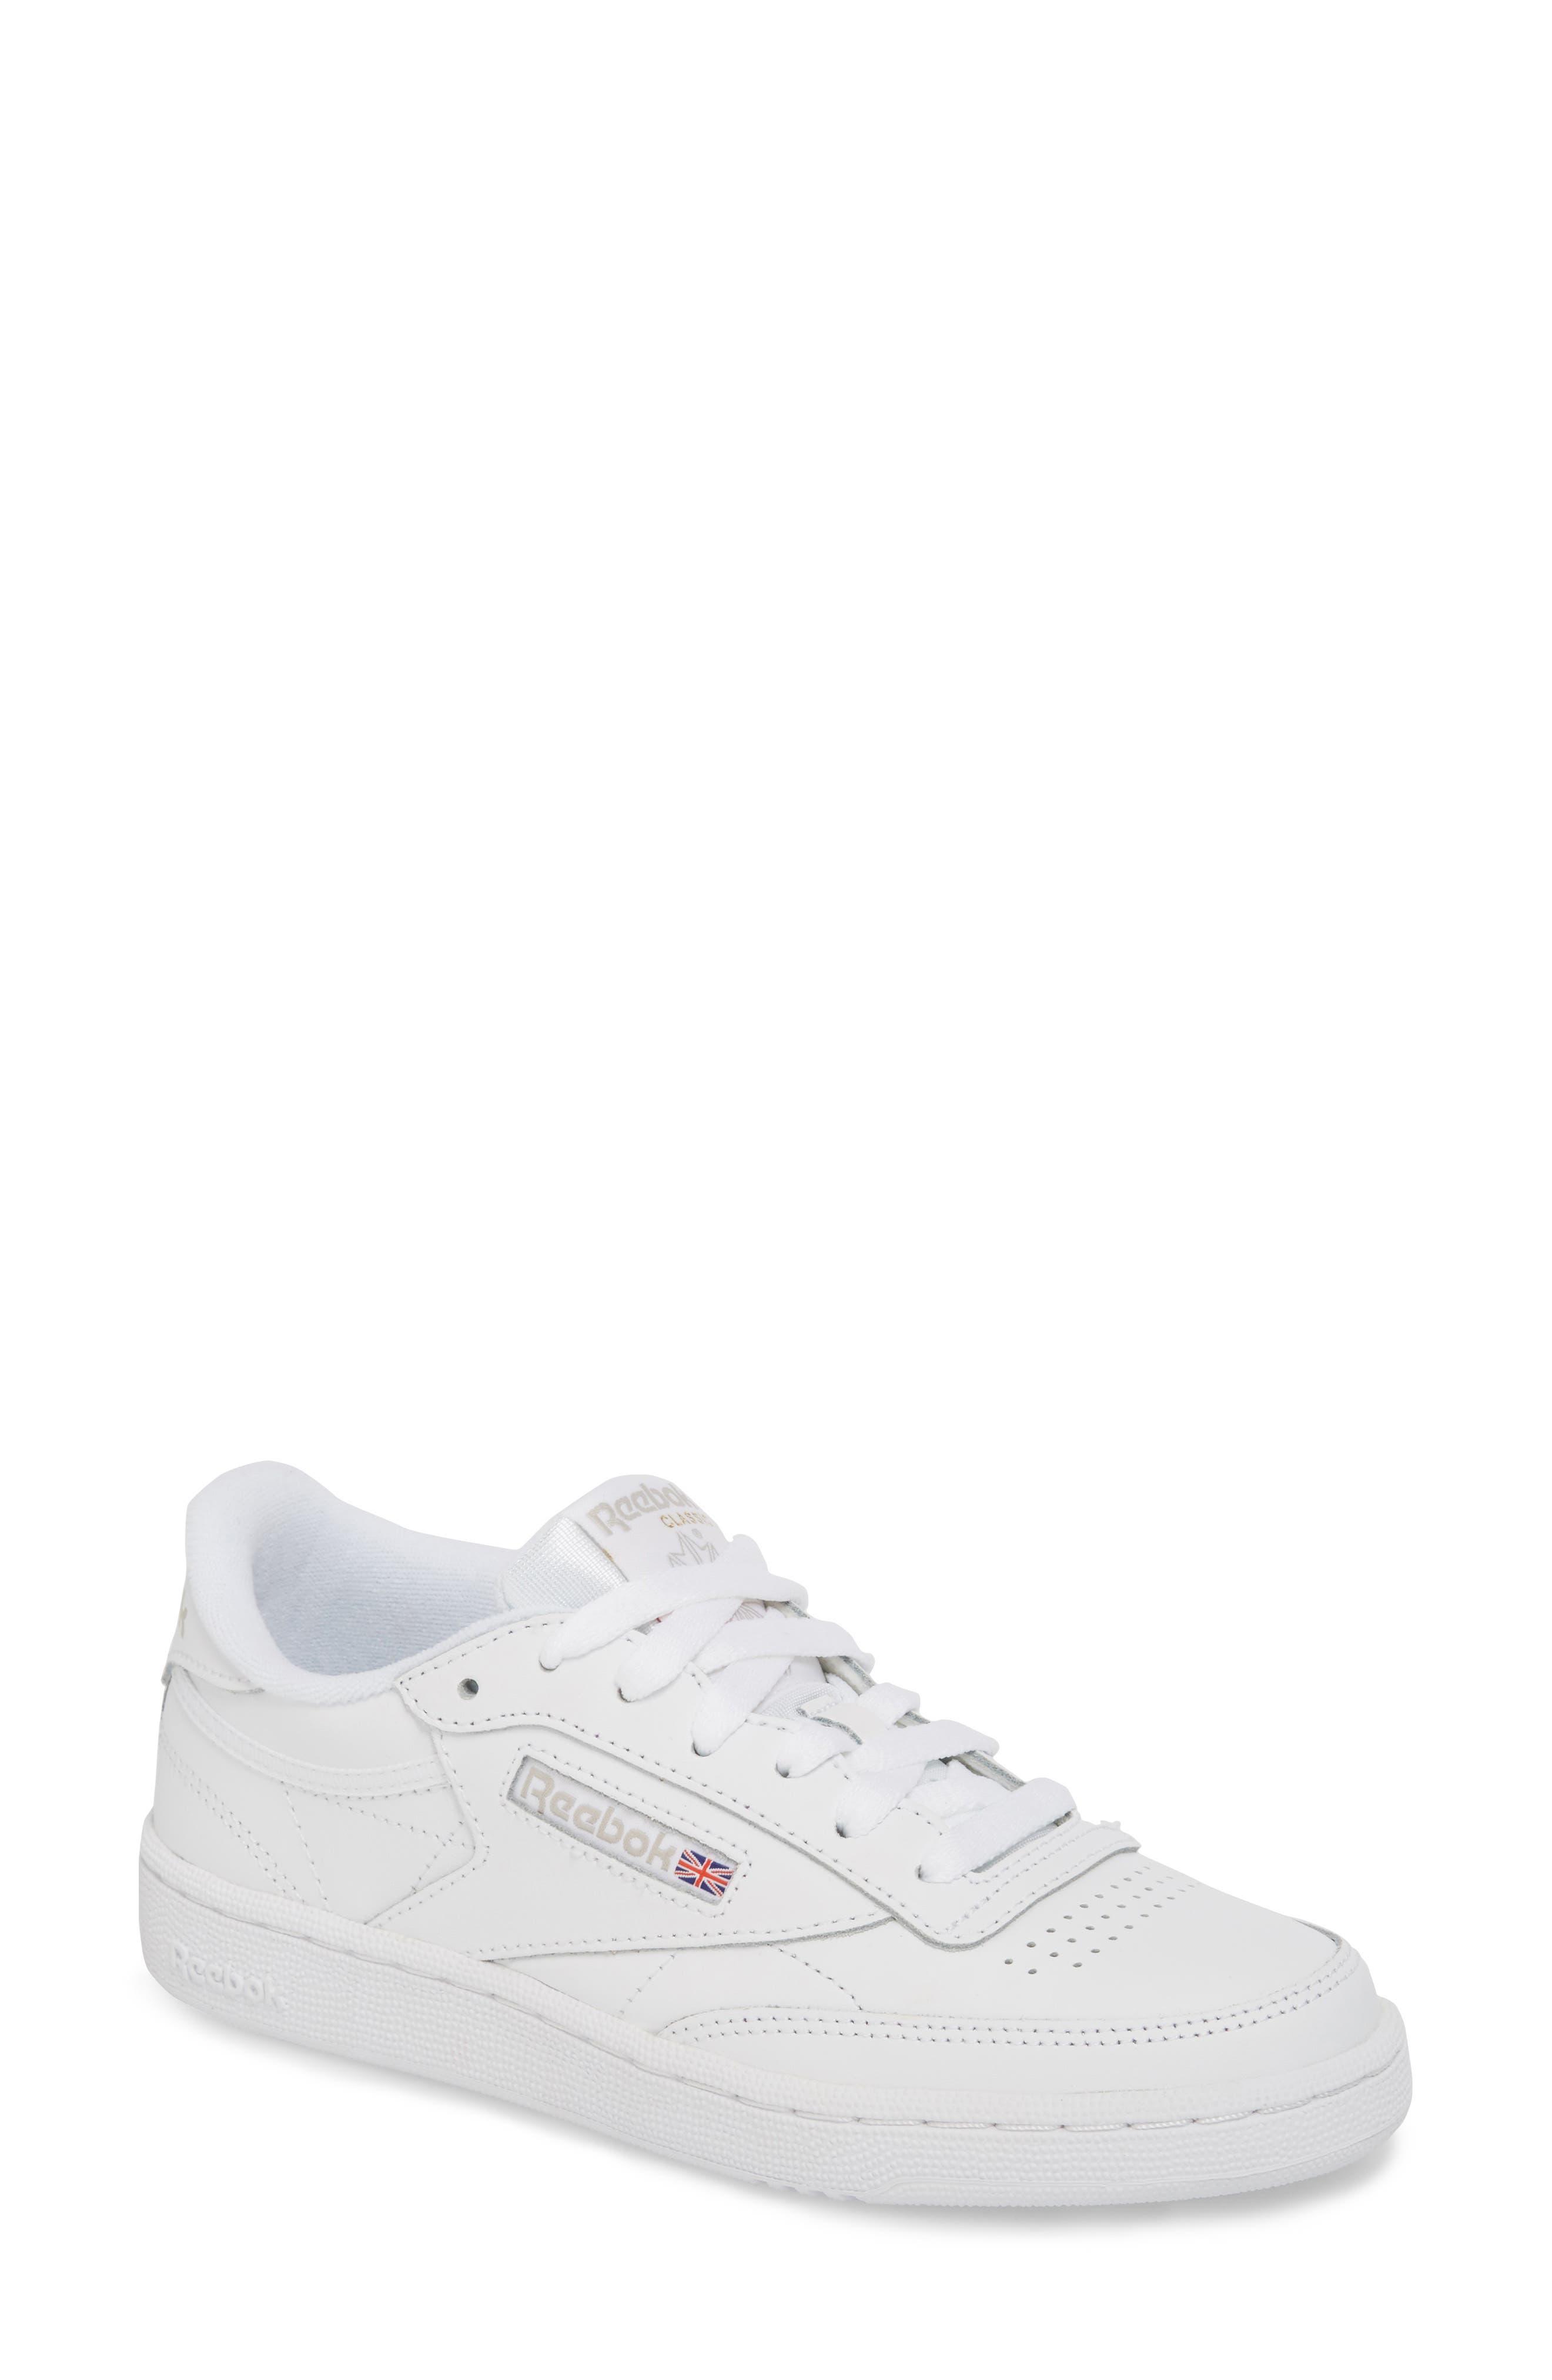 Club C 85 Sneaker,                             Main thumbnail 1, color,                             WHITE/ LIGHT GREY